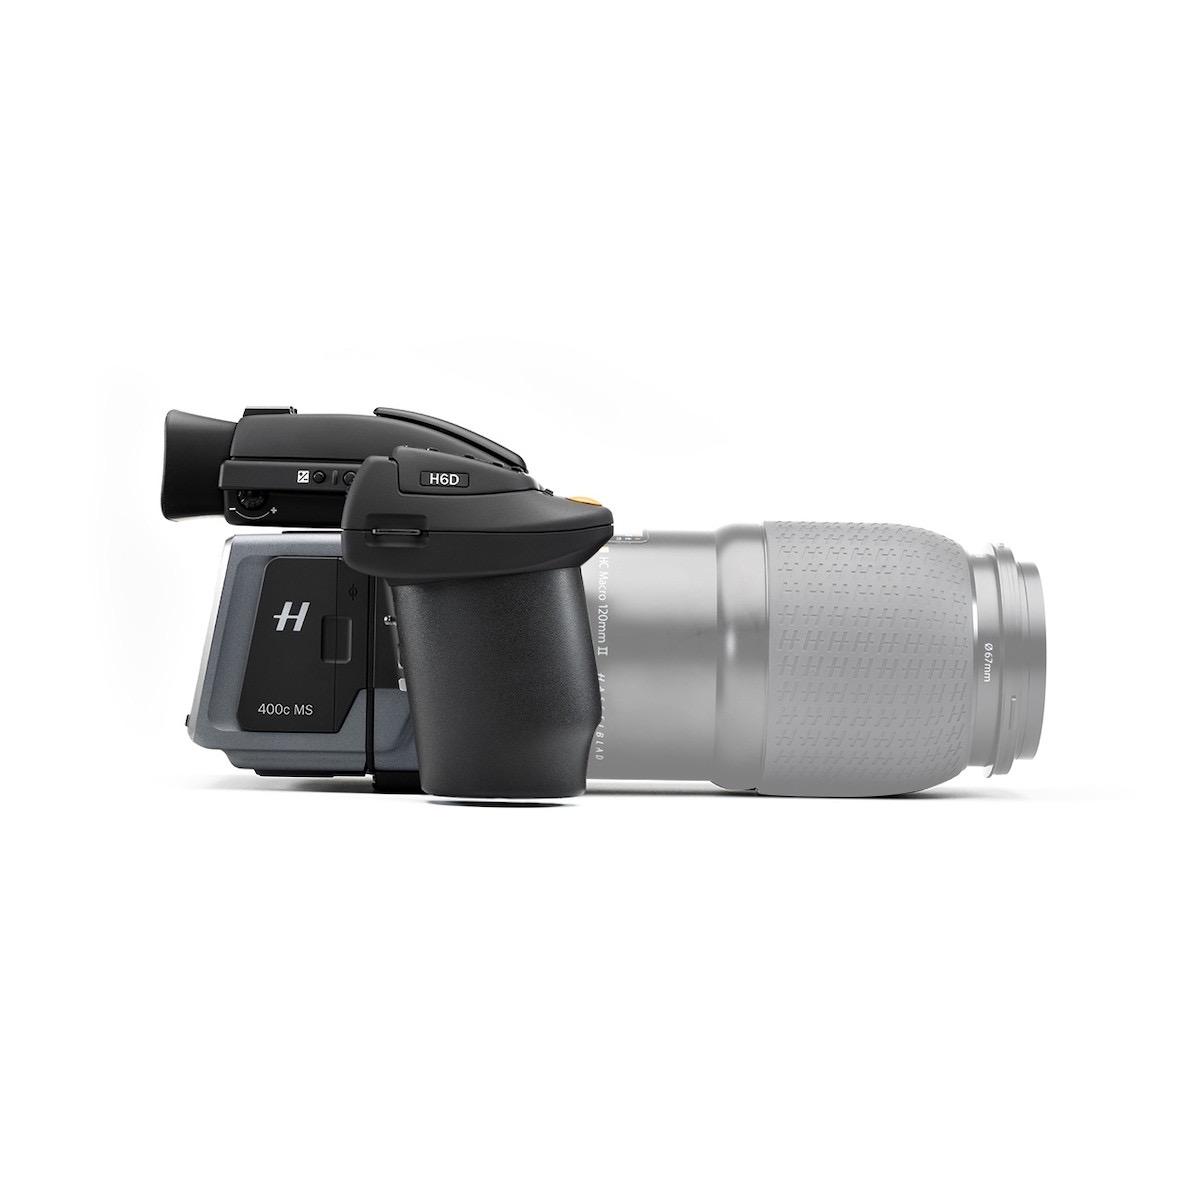 Hasselblad H6D-400c MS Gehäuse